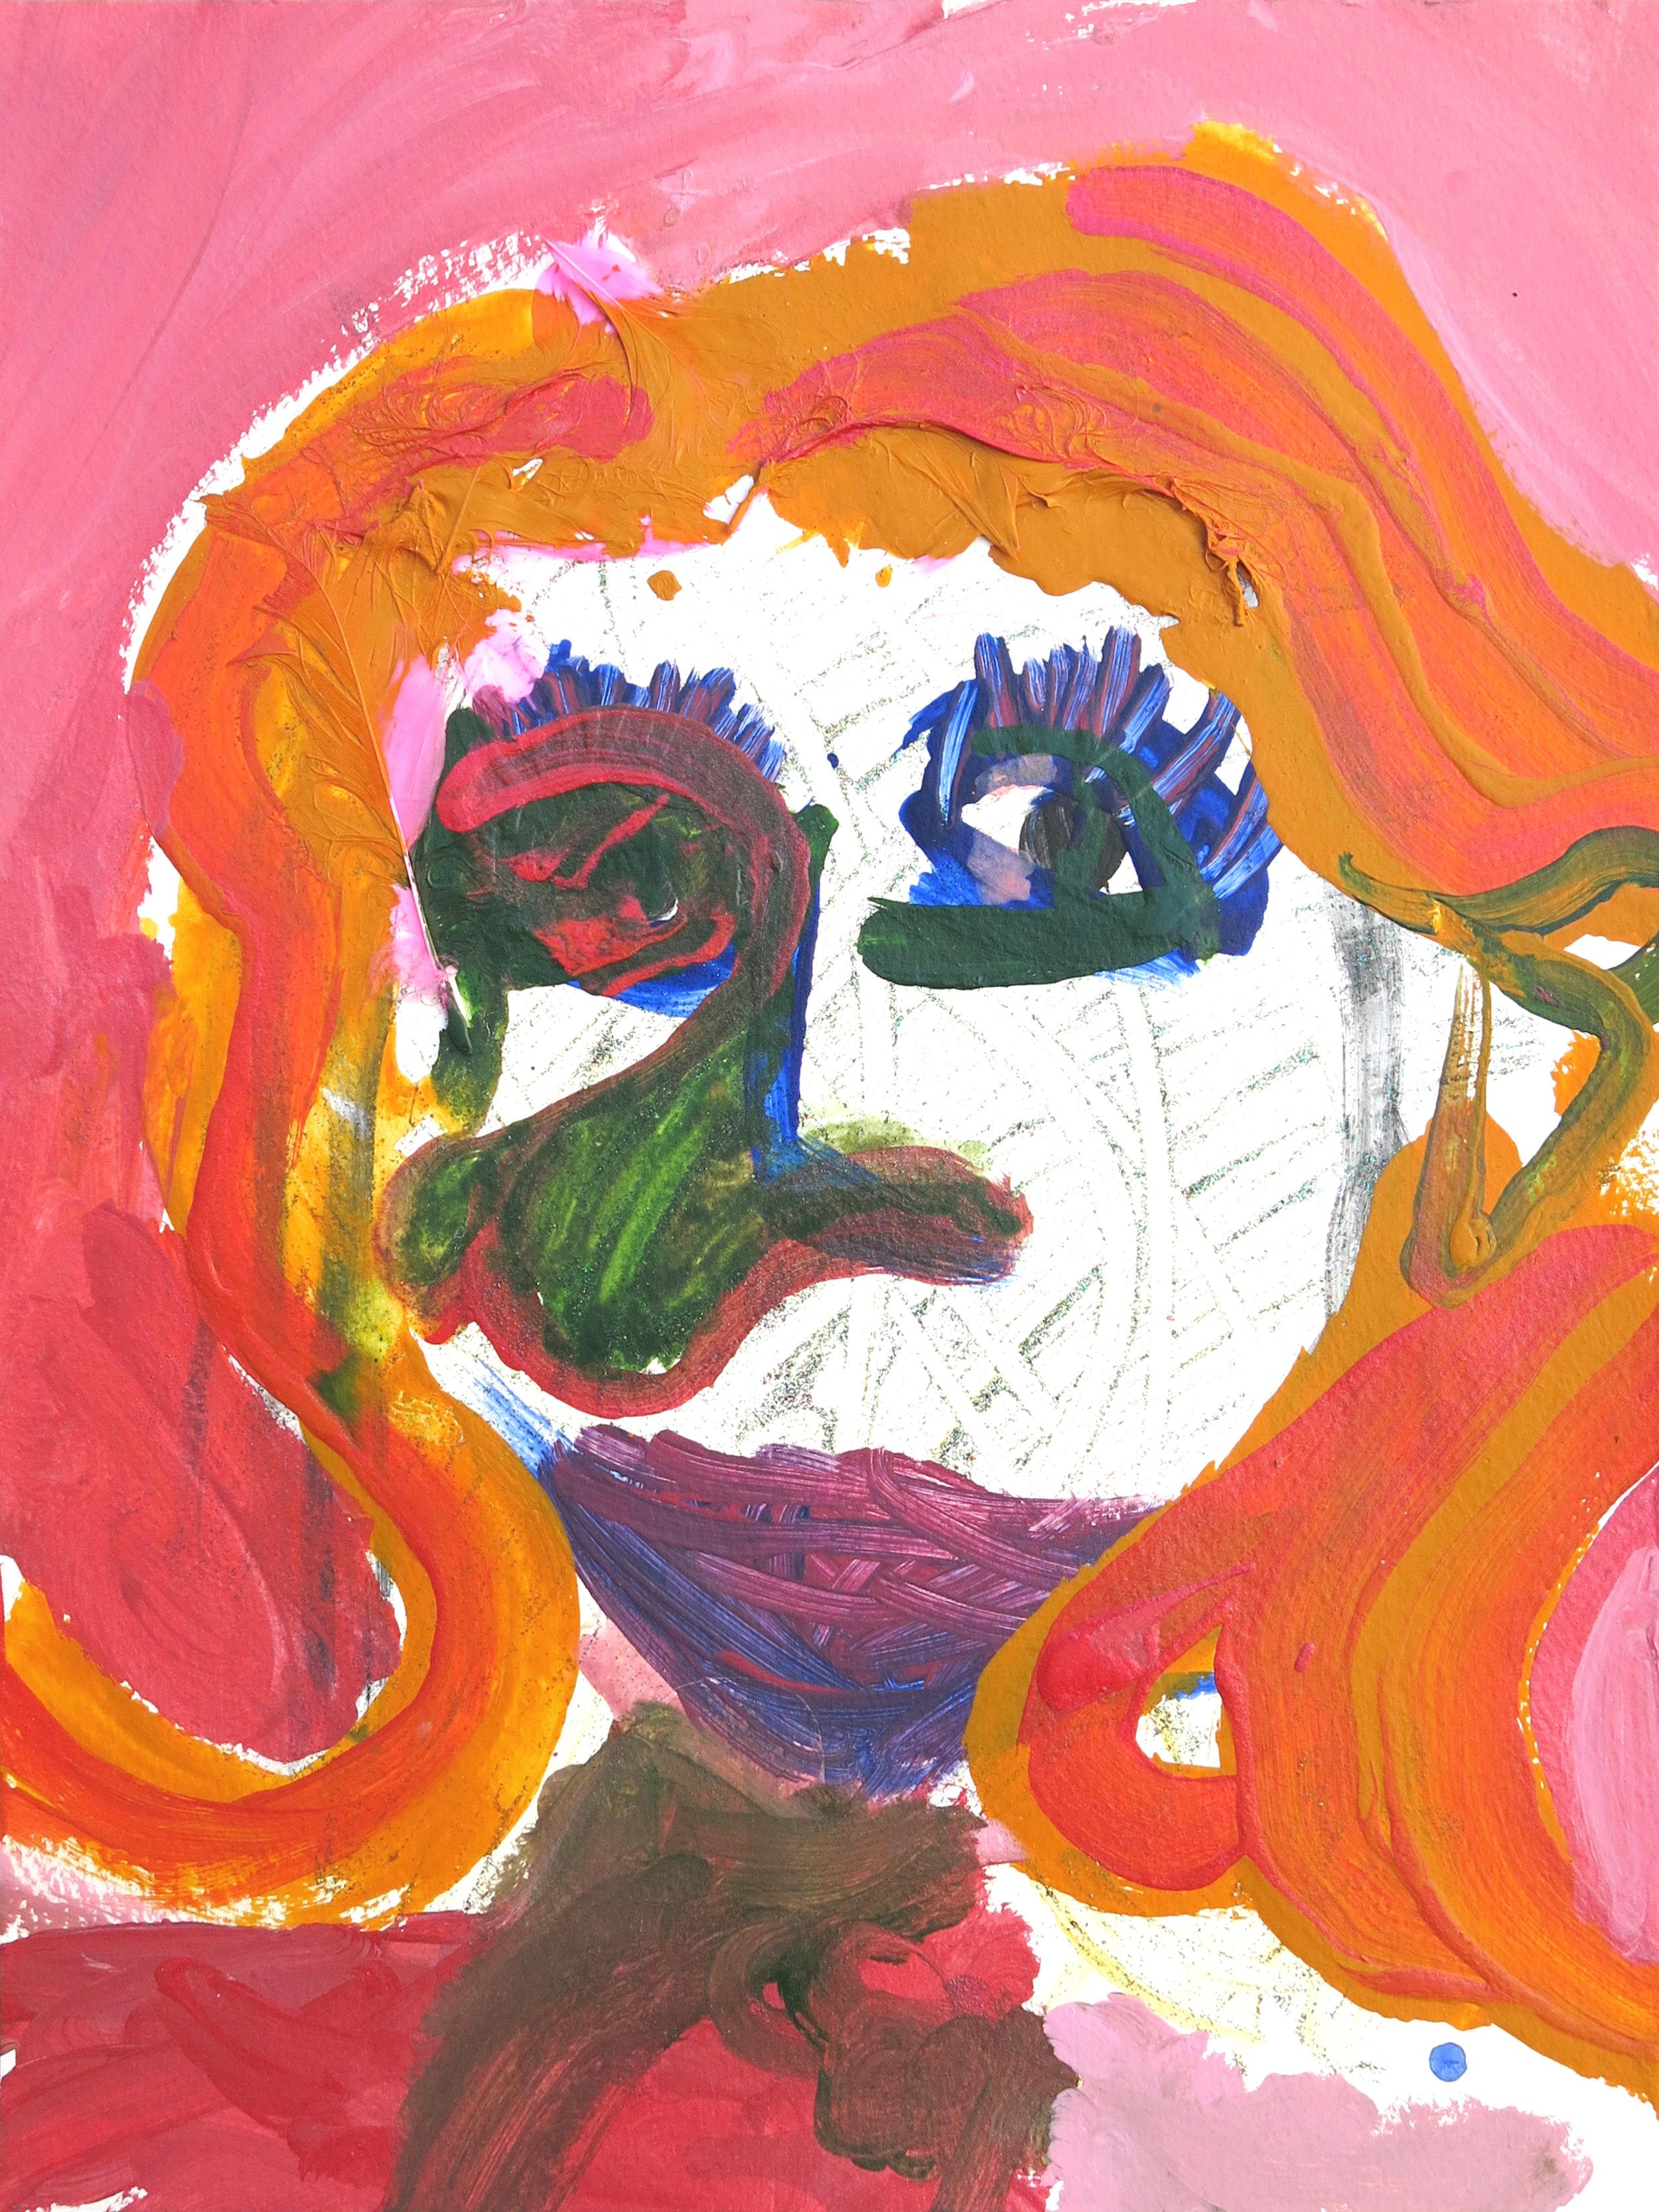 Barbra Streisand Portrait #197